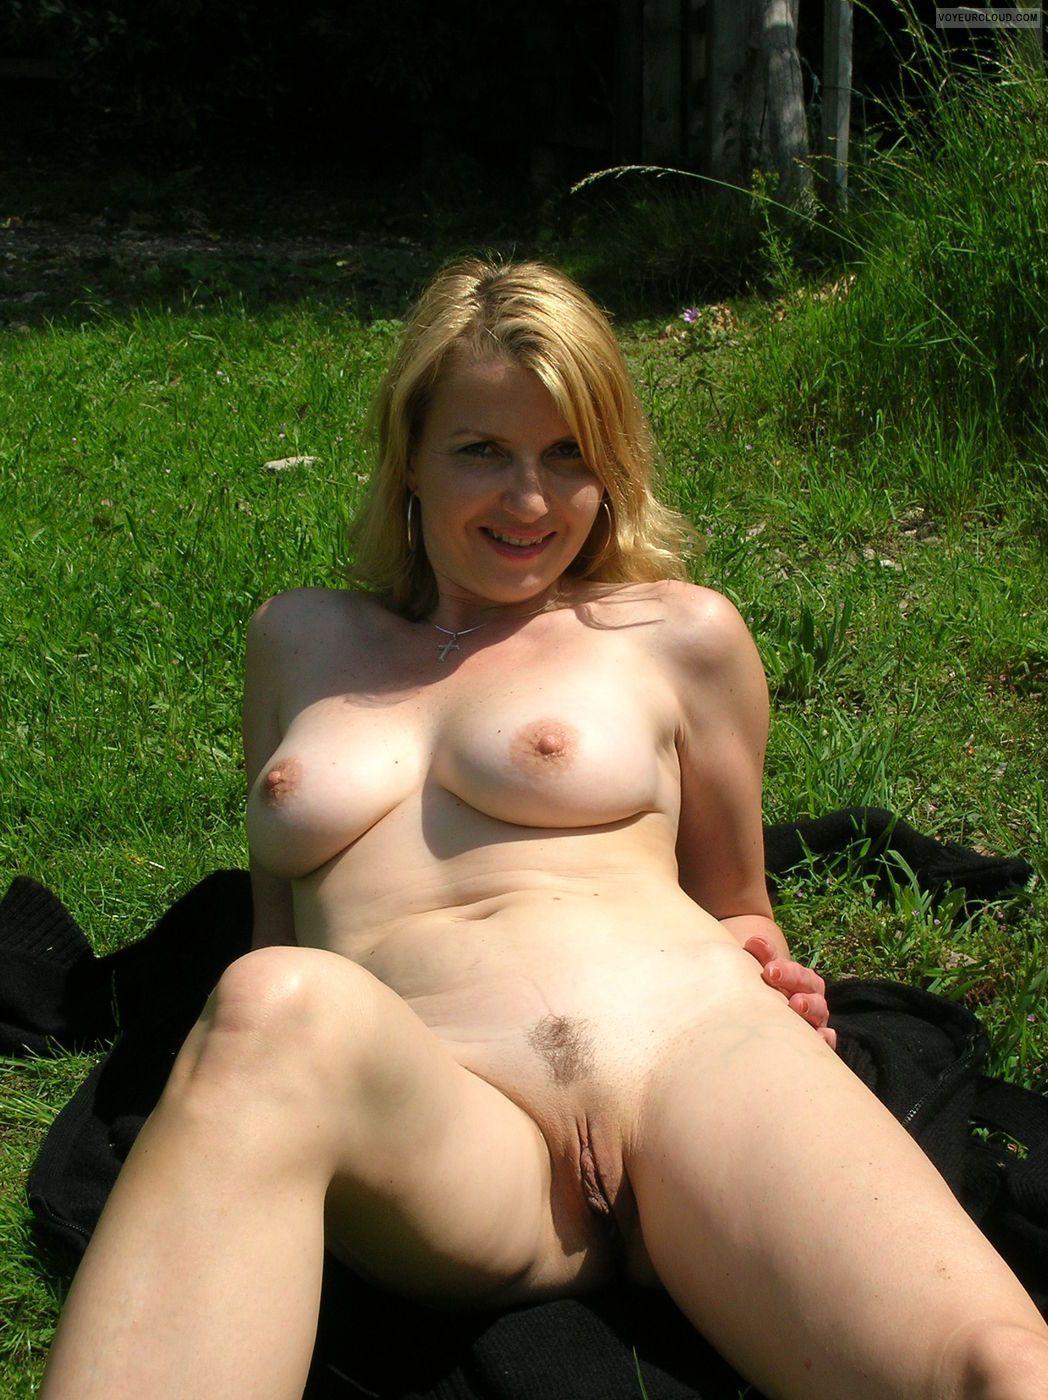 Amateur milf outdoor shower